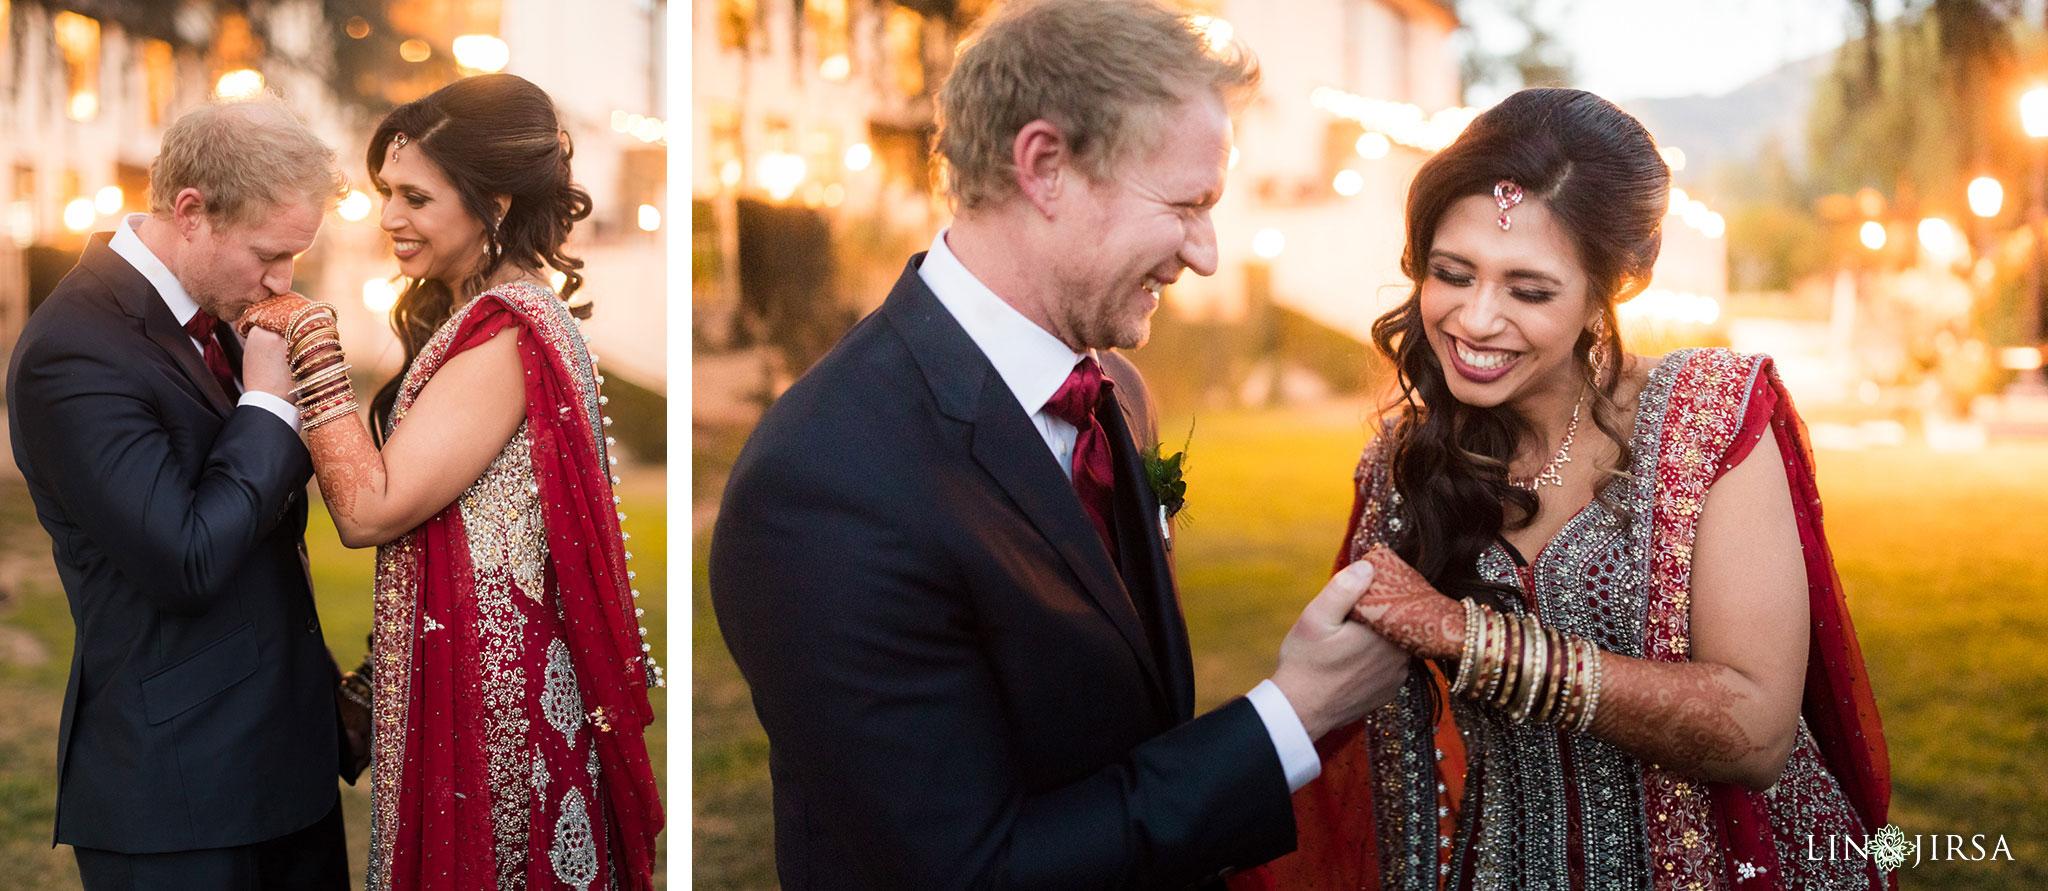 32 altadena town country club pakistani wedding photography